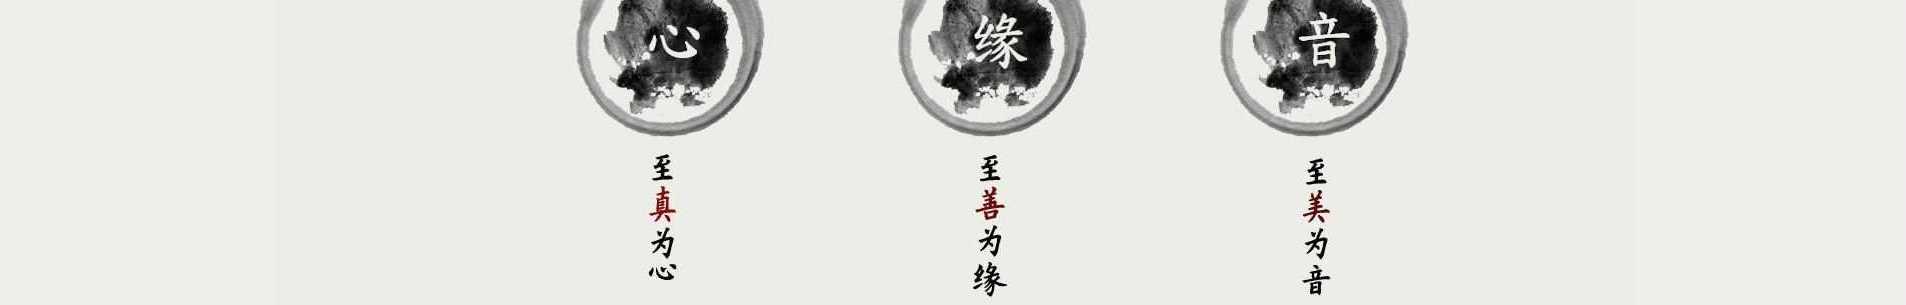 默默西风 banner